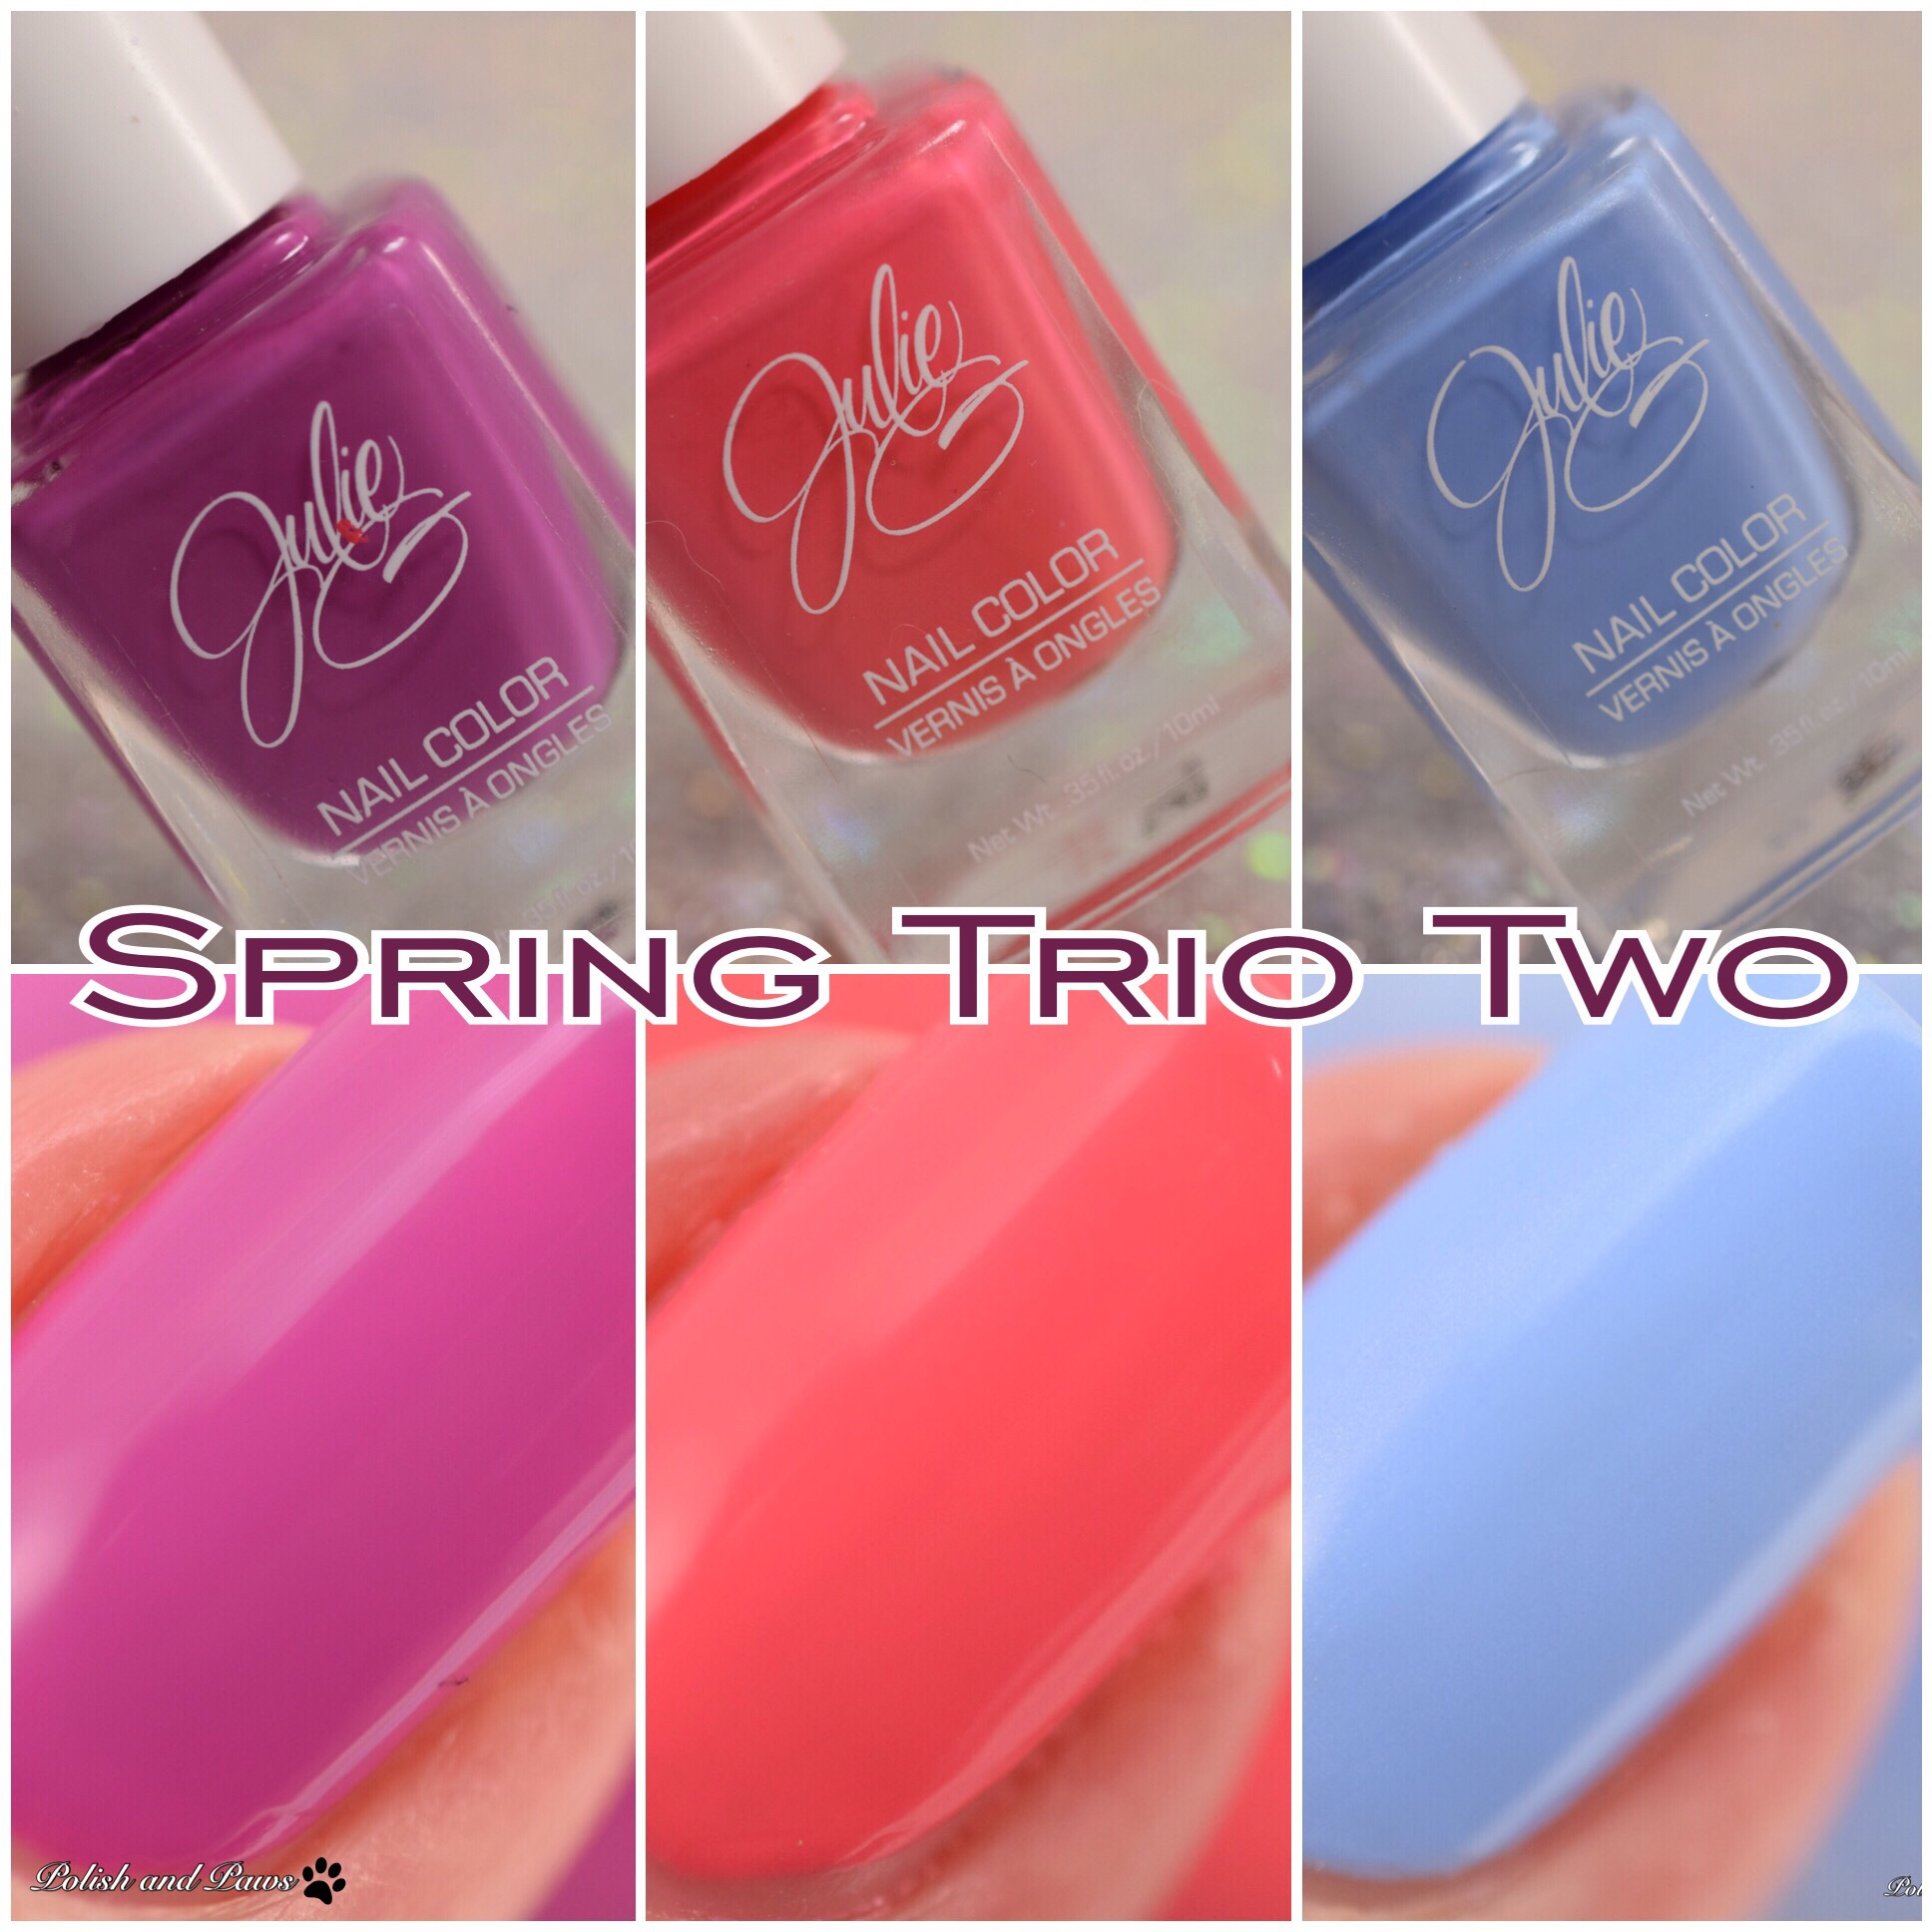 Julie G Spring Trio 2